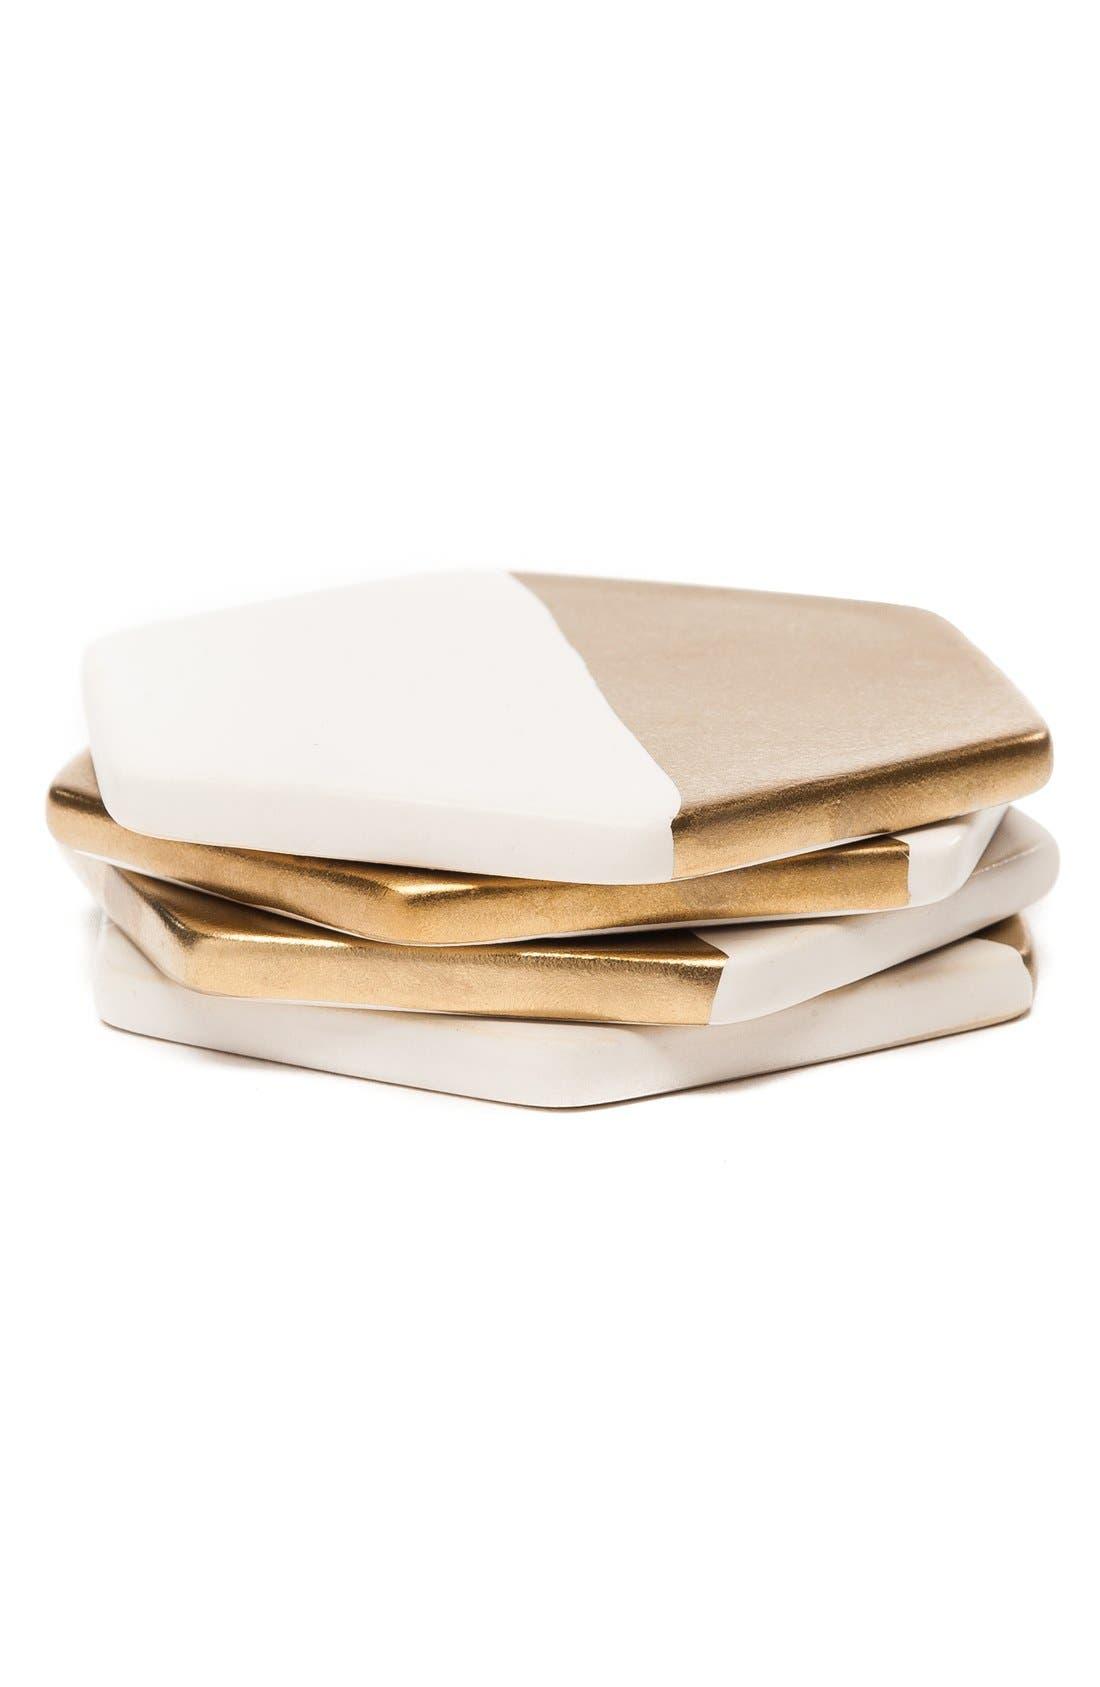 Main Image - zestt 'Hampton' Gilded Ceramic Coasters (Set of 4)